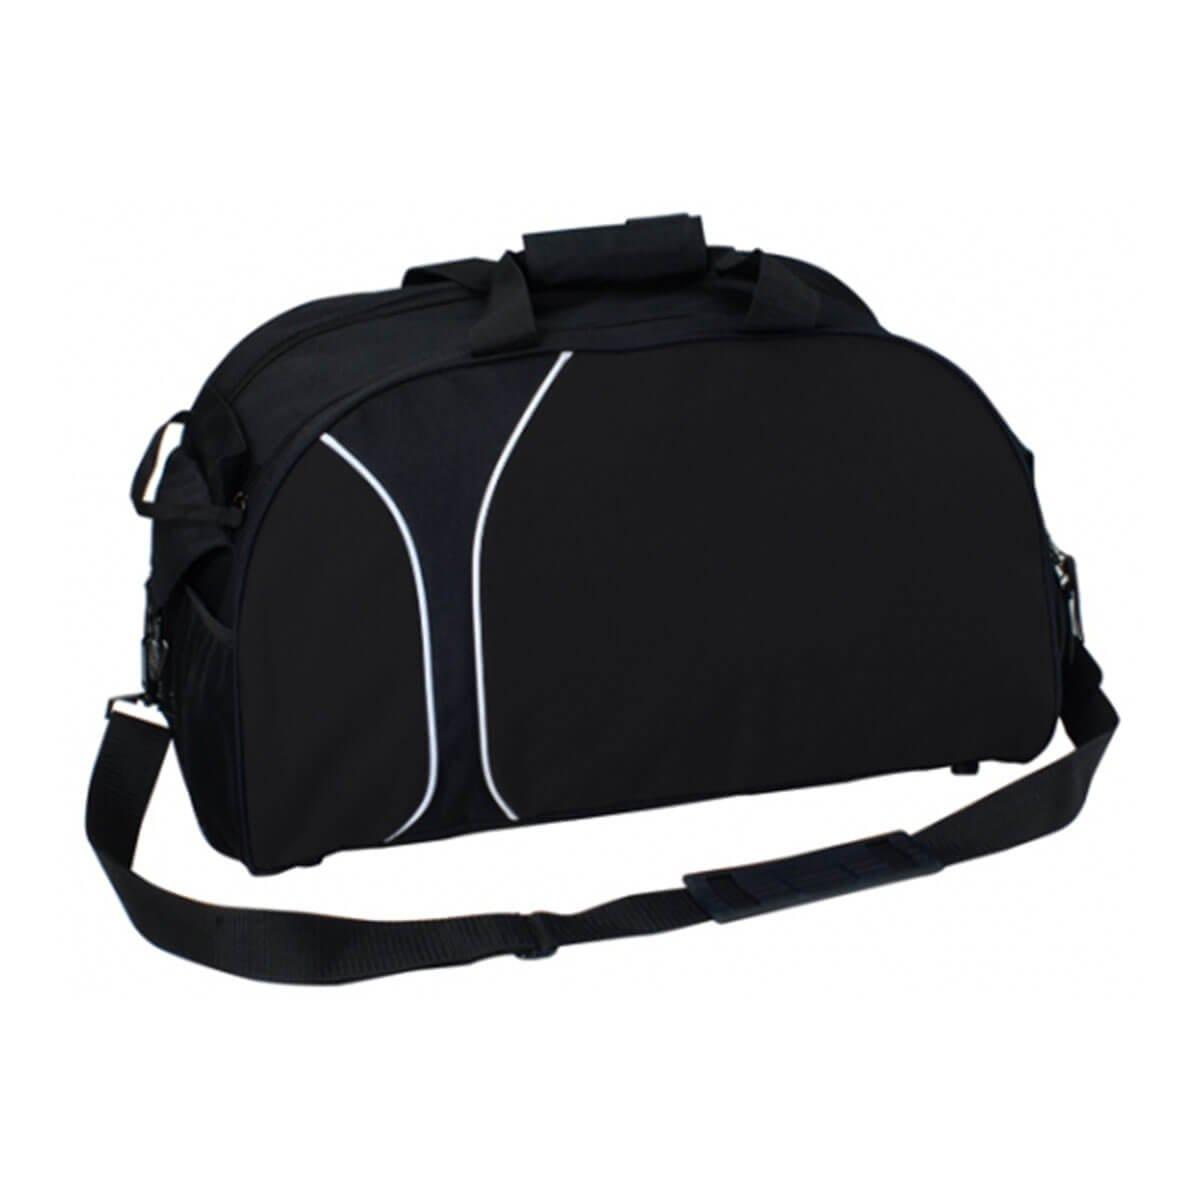 Travel Sports Bag-Black / Black